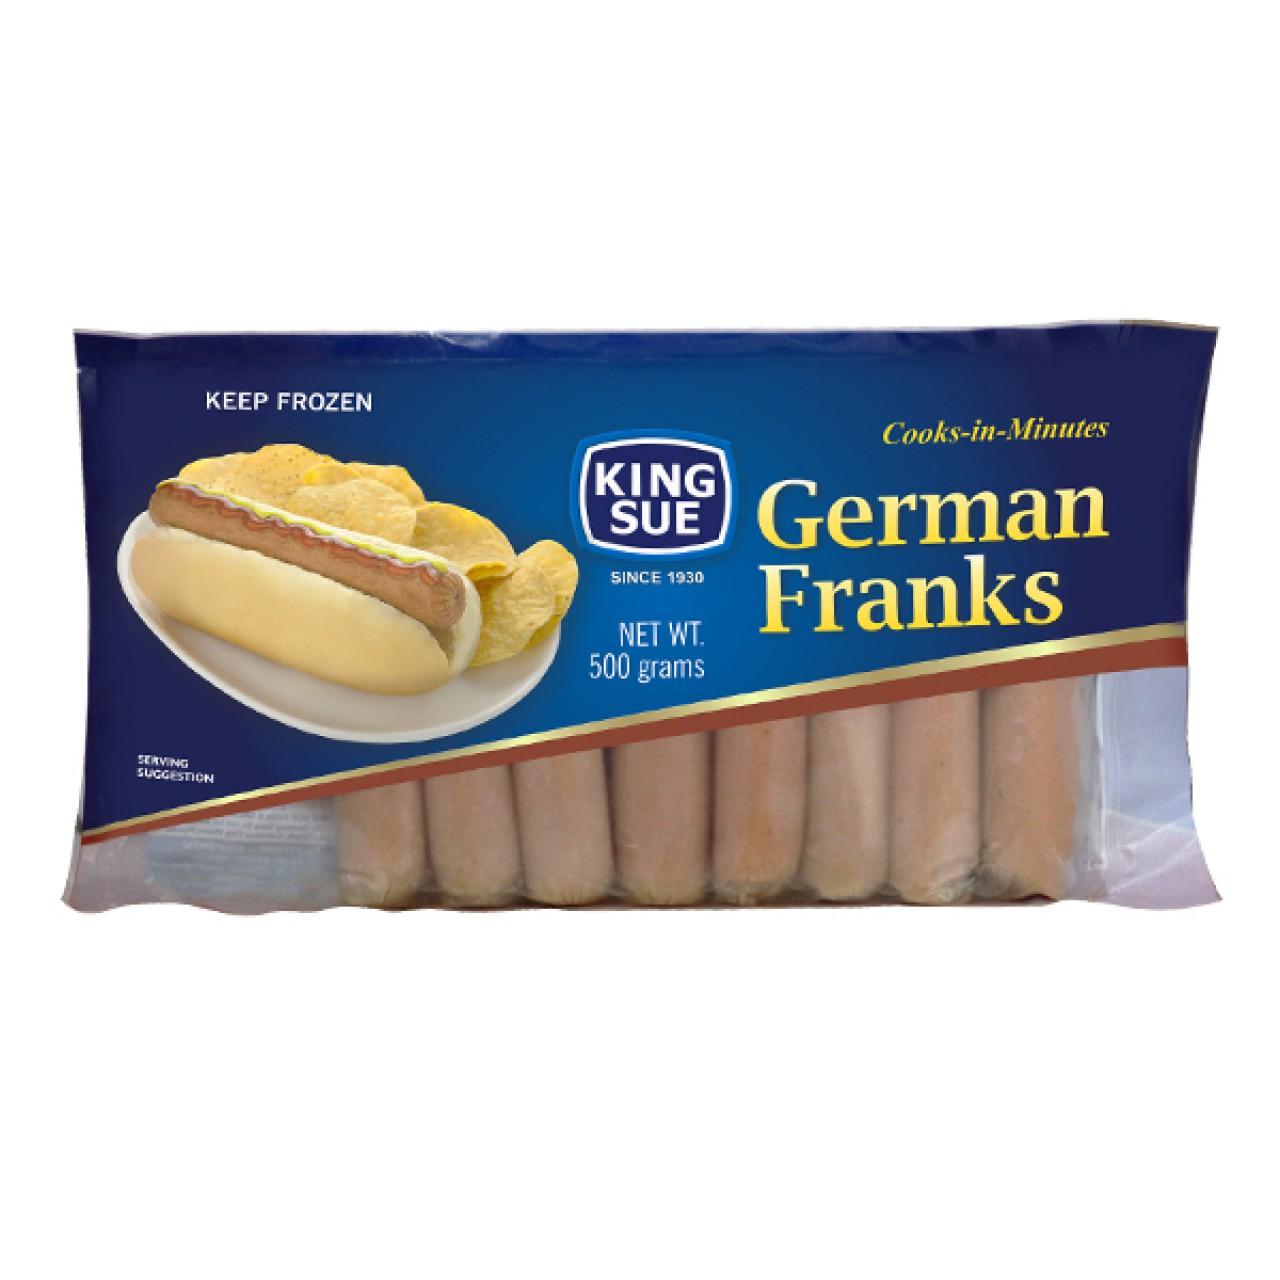 KING SUE GERMAN FRANKS 500G